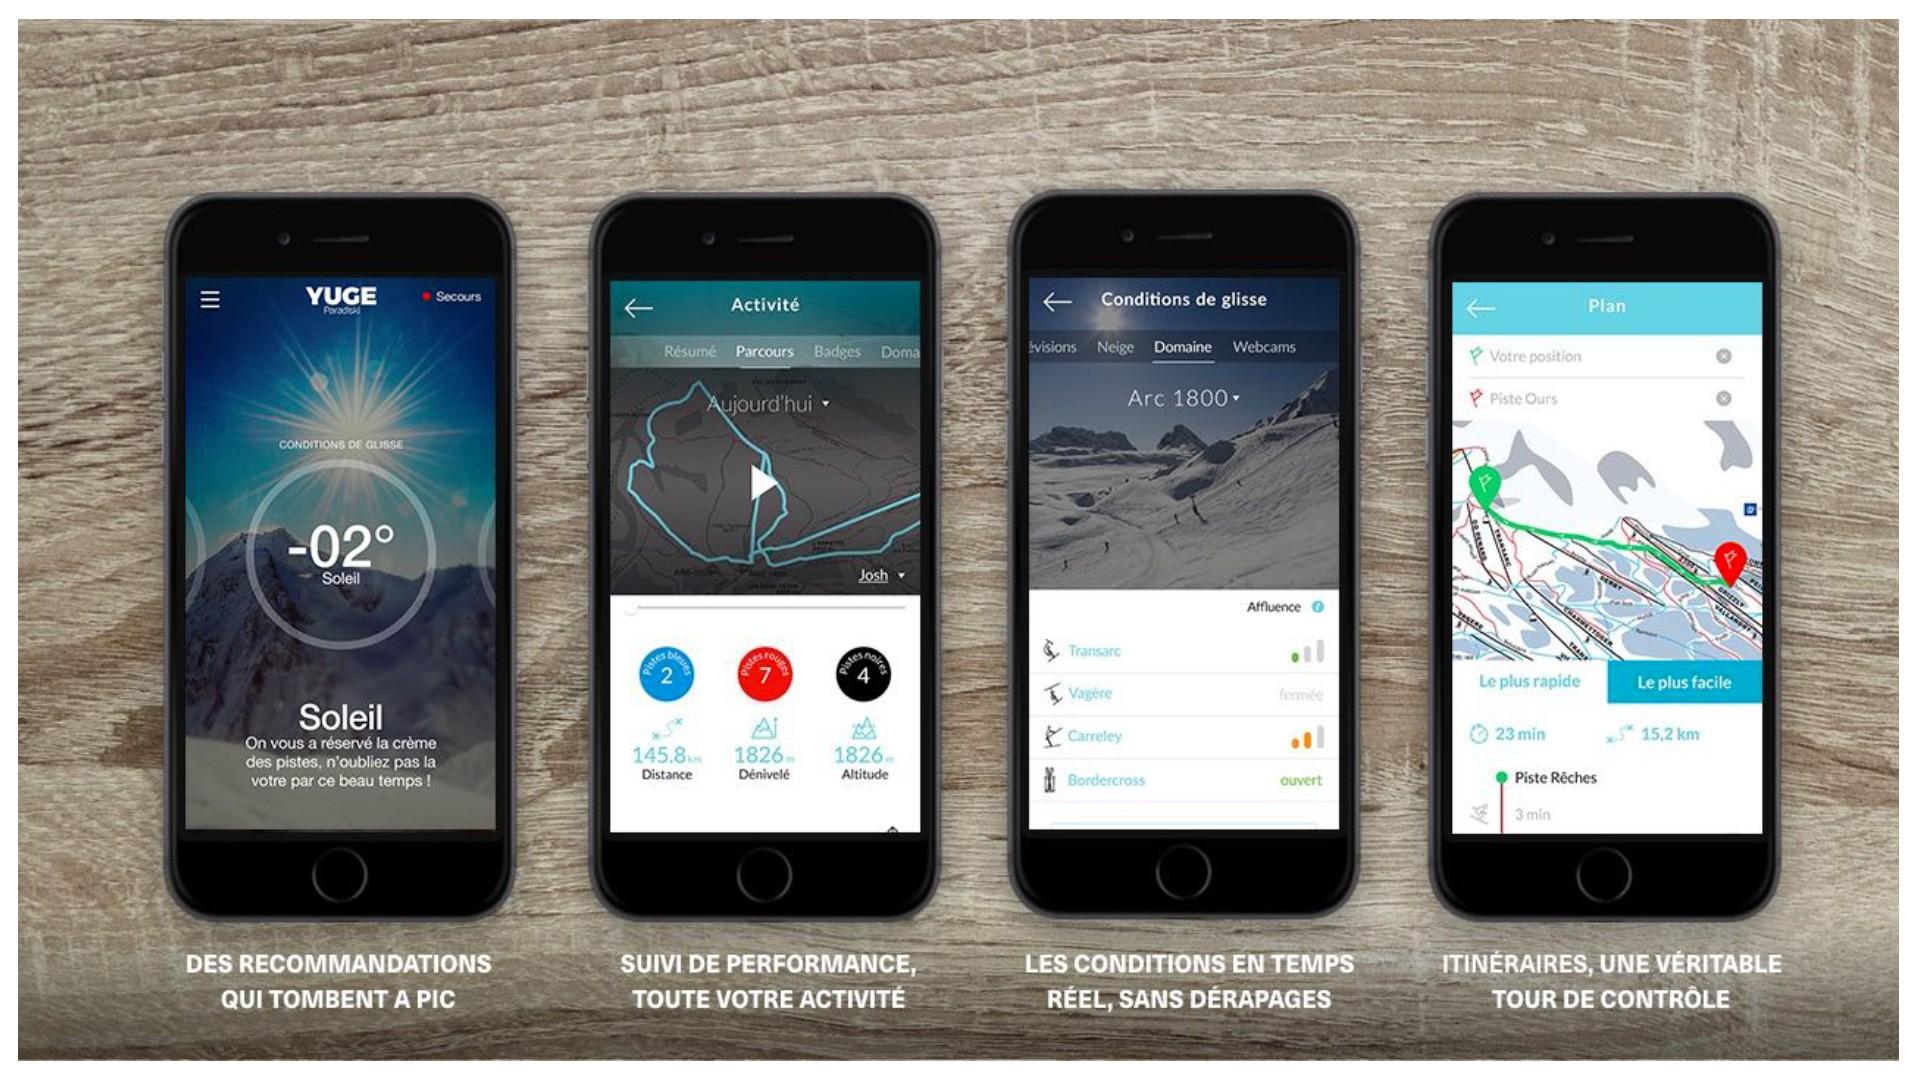 Yuge-visuels-app